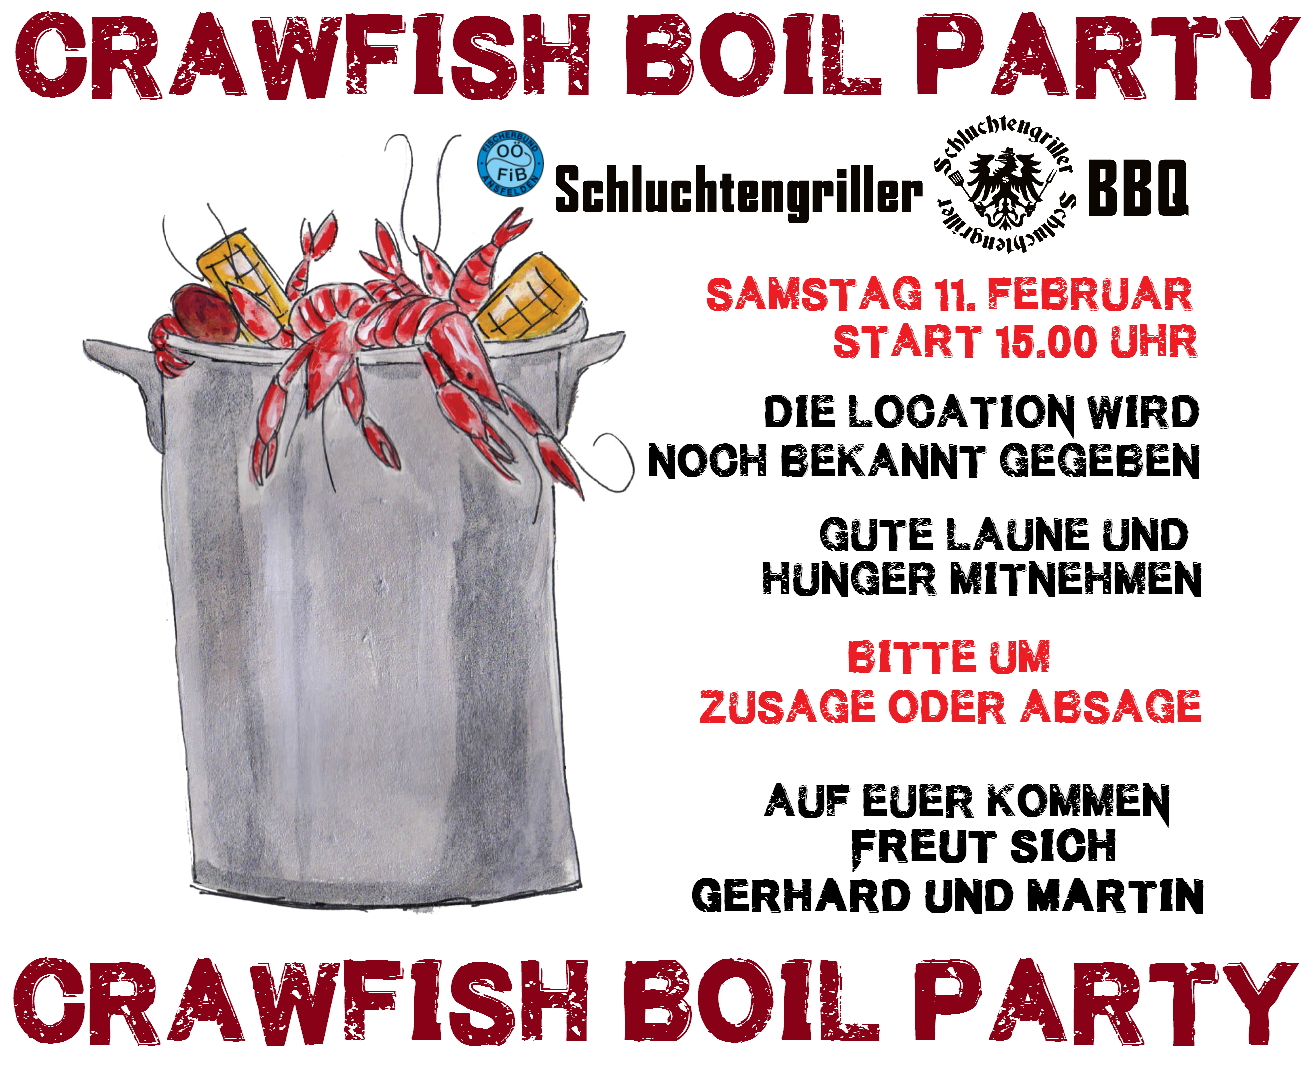 3_Crawfishboilparty 3_fertig.jpg